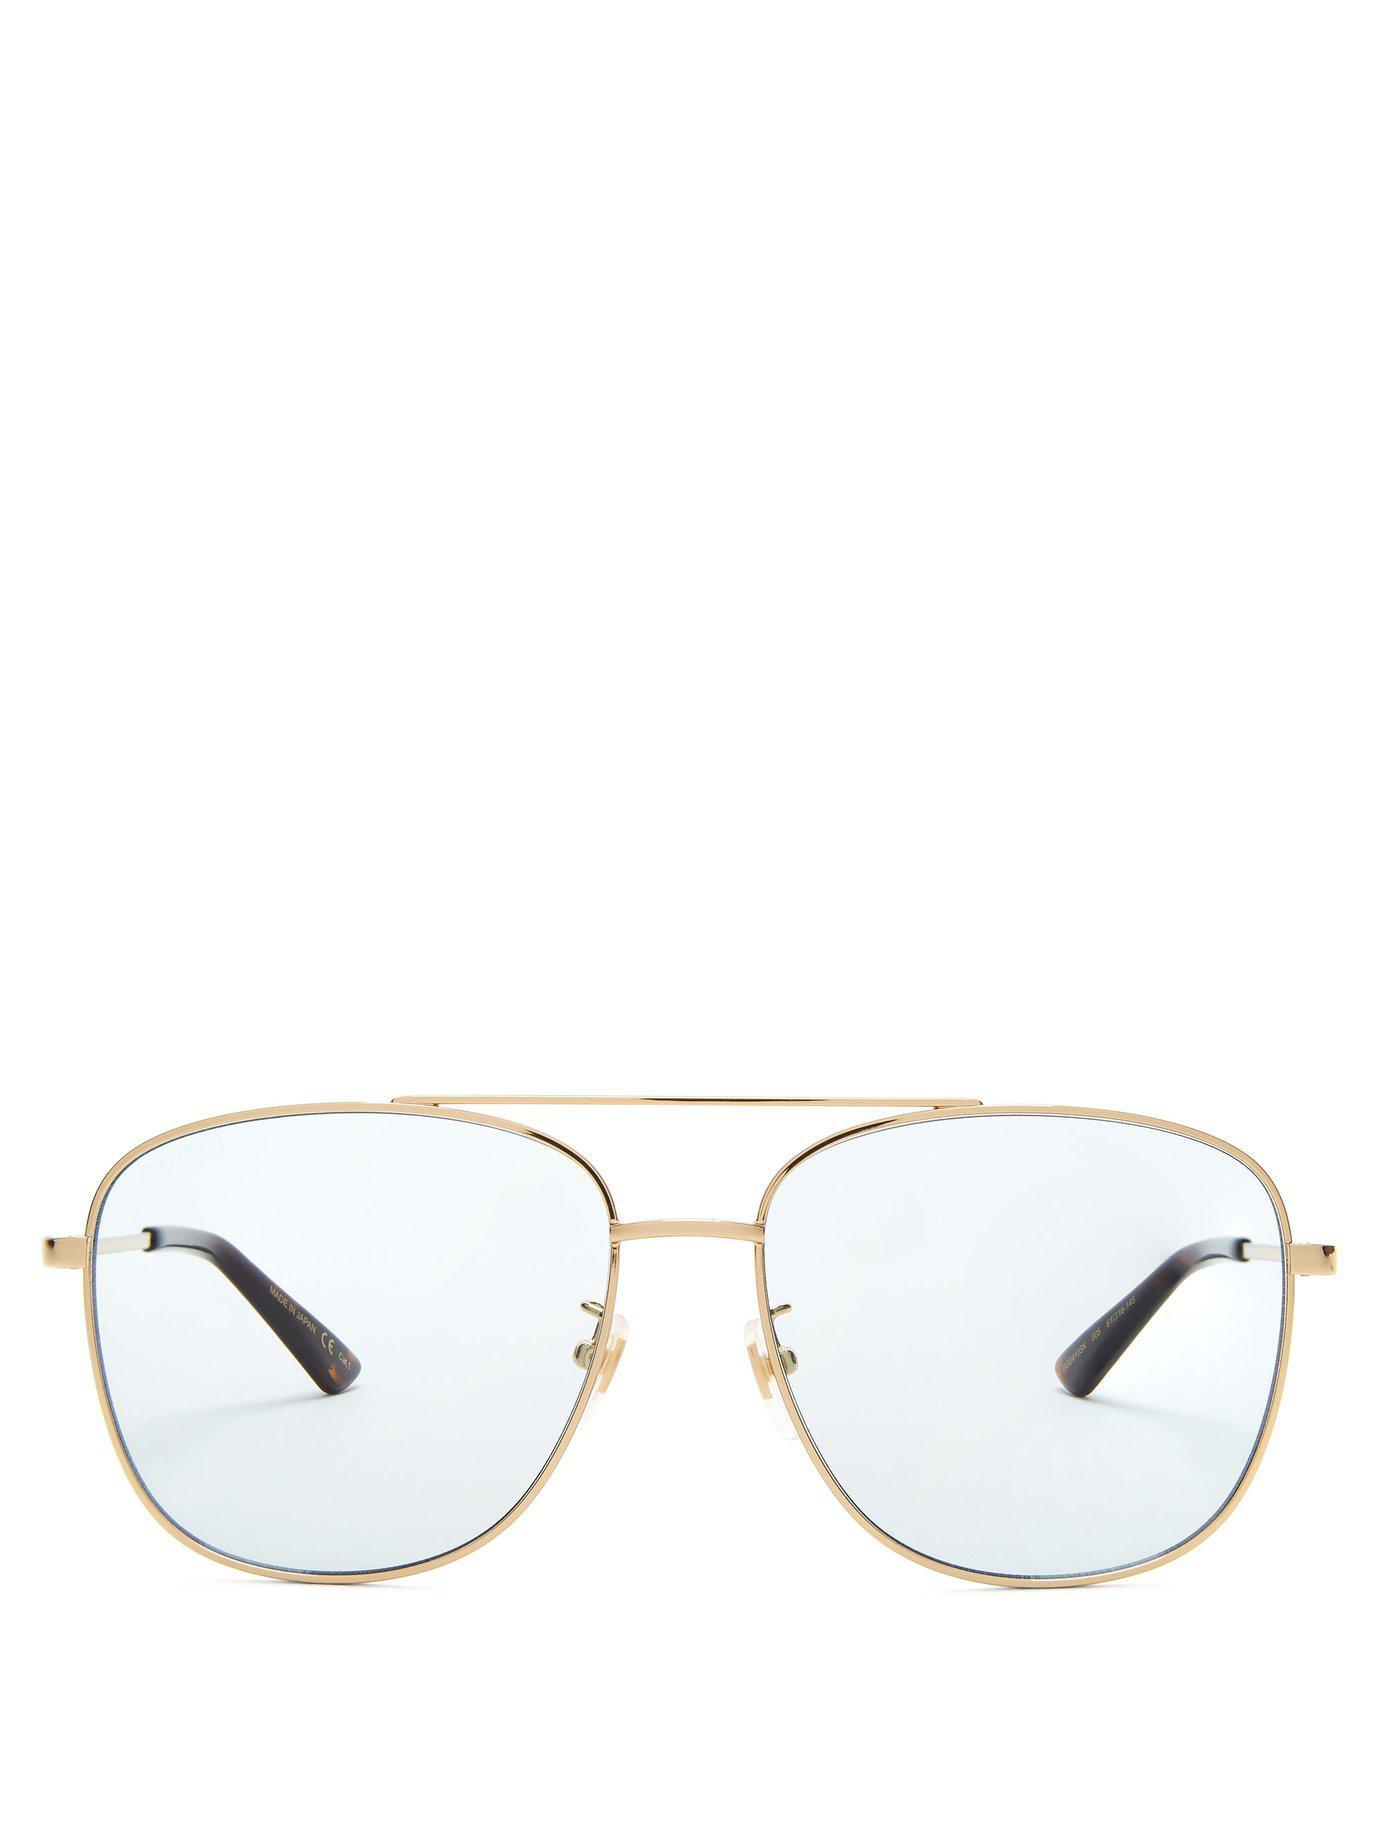 63be47d7182 Gucci Aviator Square Frame Metal Sunglasses in Blue - Lyst